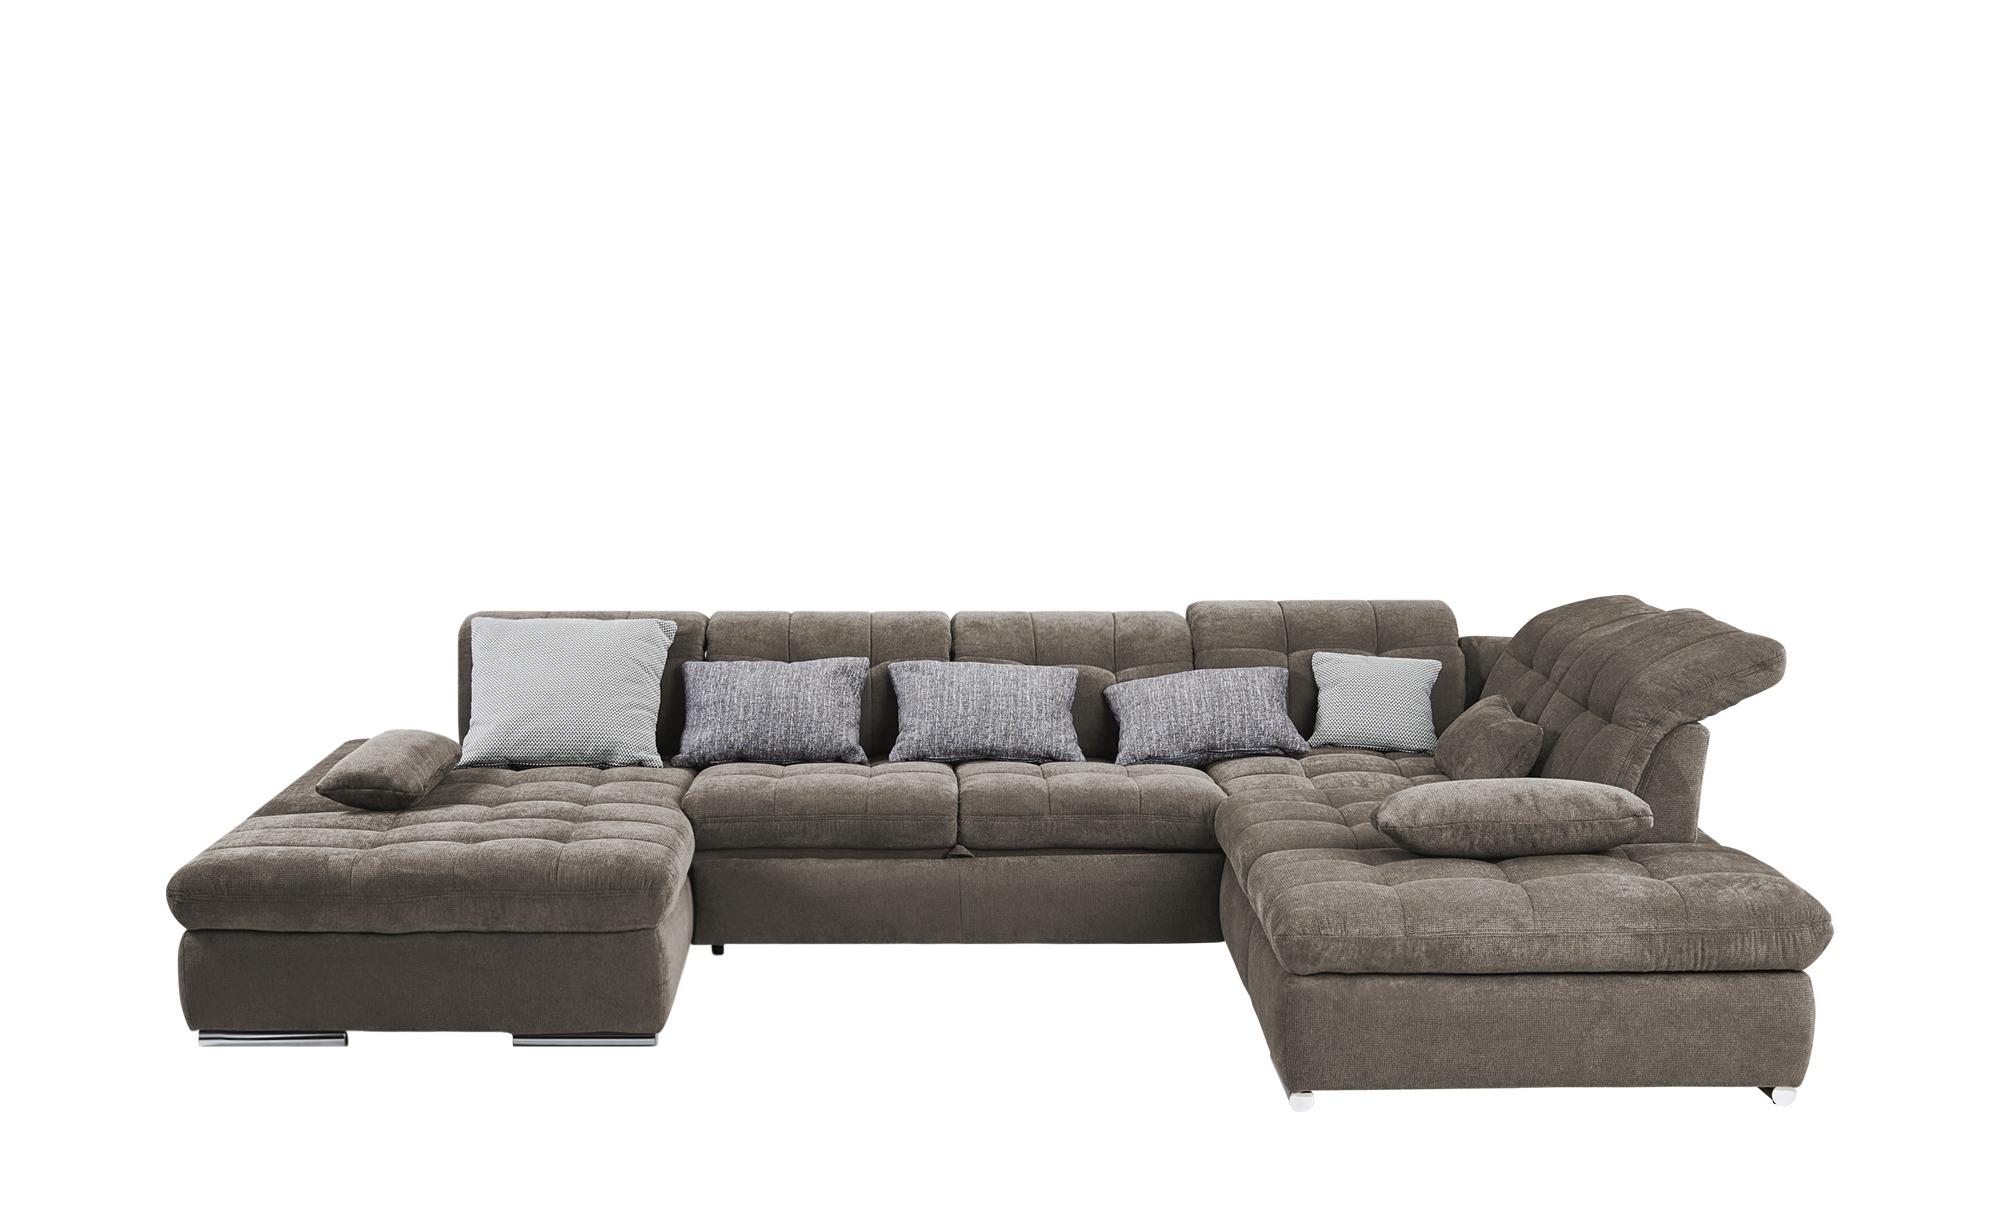 Wohnlandschaft La Palmabraunmaterialmix81 Cm Hoffner Jetzt Bestellen Unter Https Moebel Ladendirekt De Wohnzimmer Sofas Wohnlands Sectional Couch